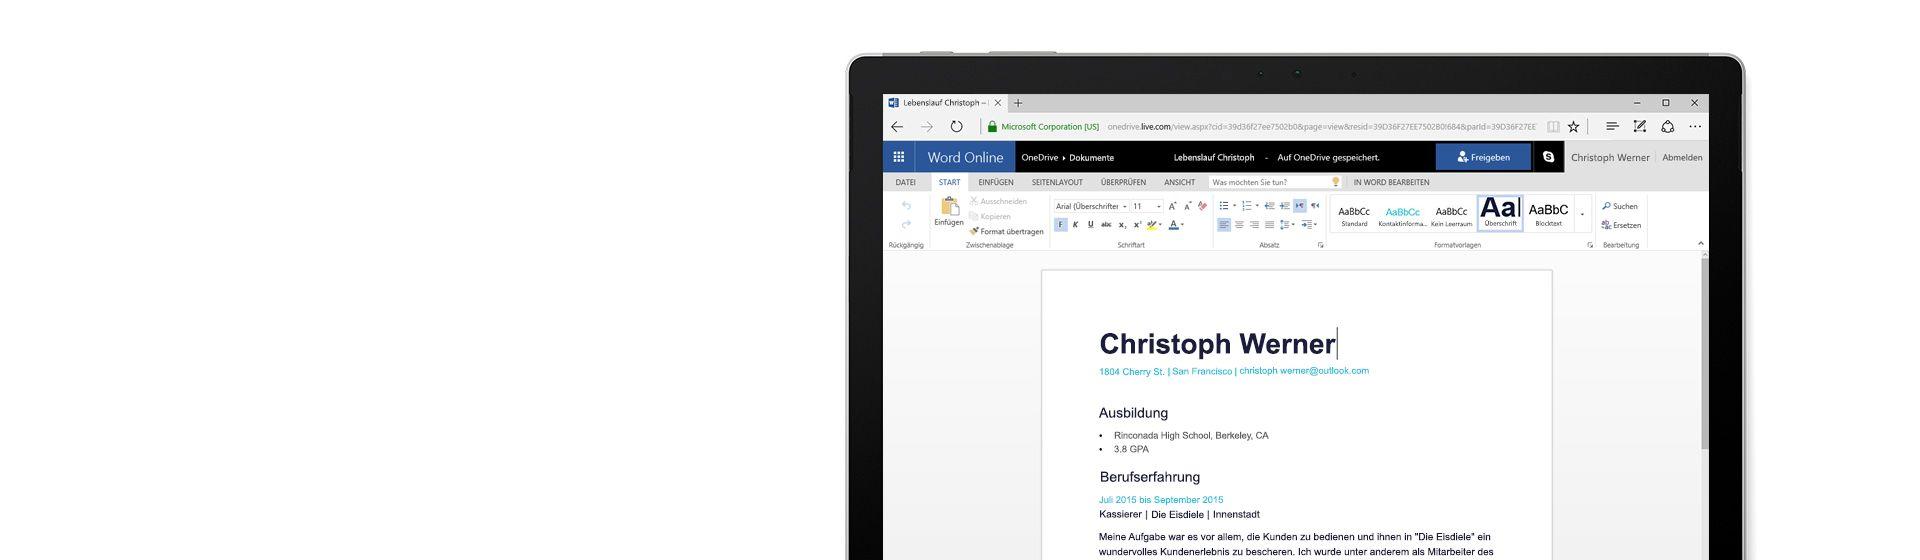 Kostenlos: Microsoft Office Online – Word, Excel, PowerPoint